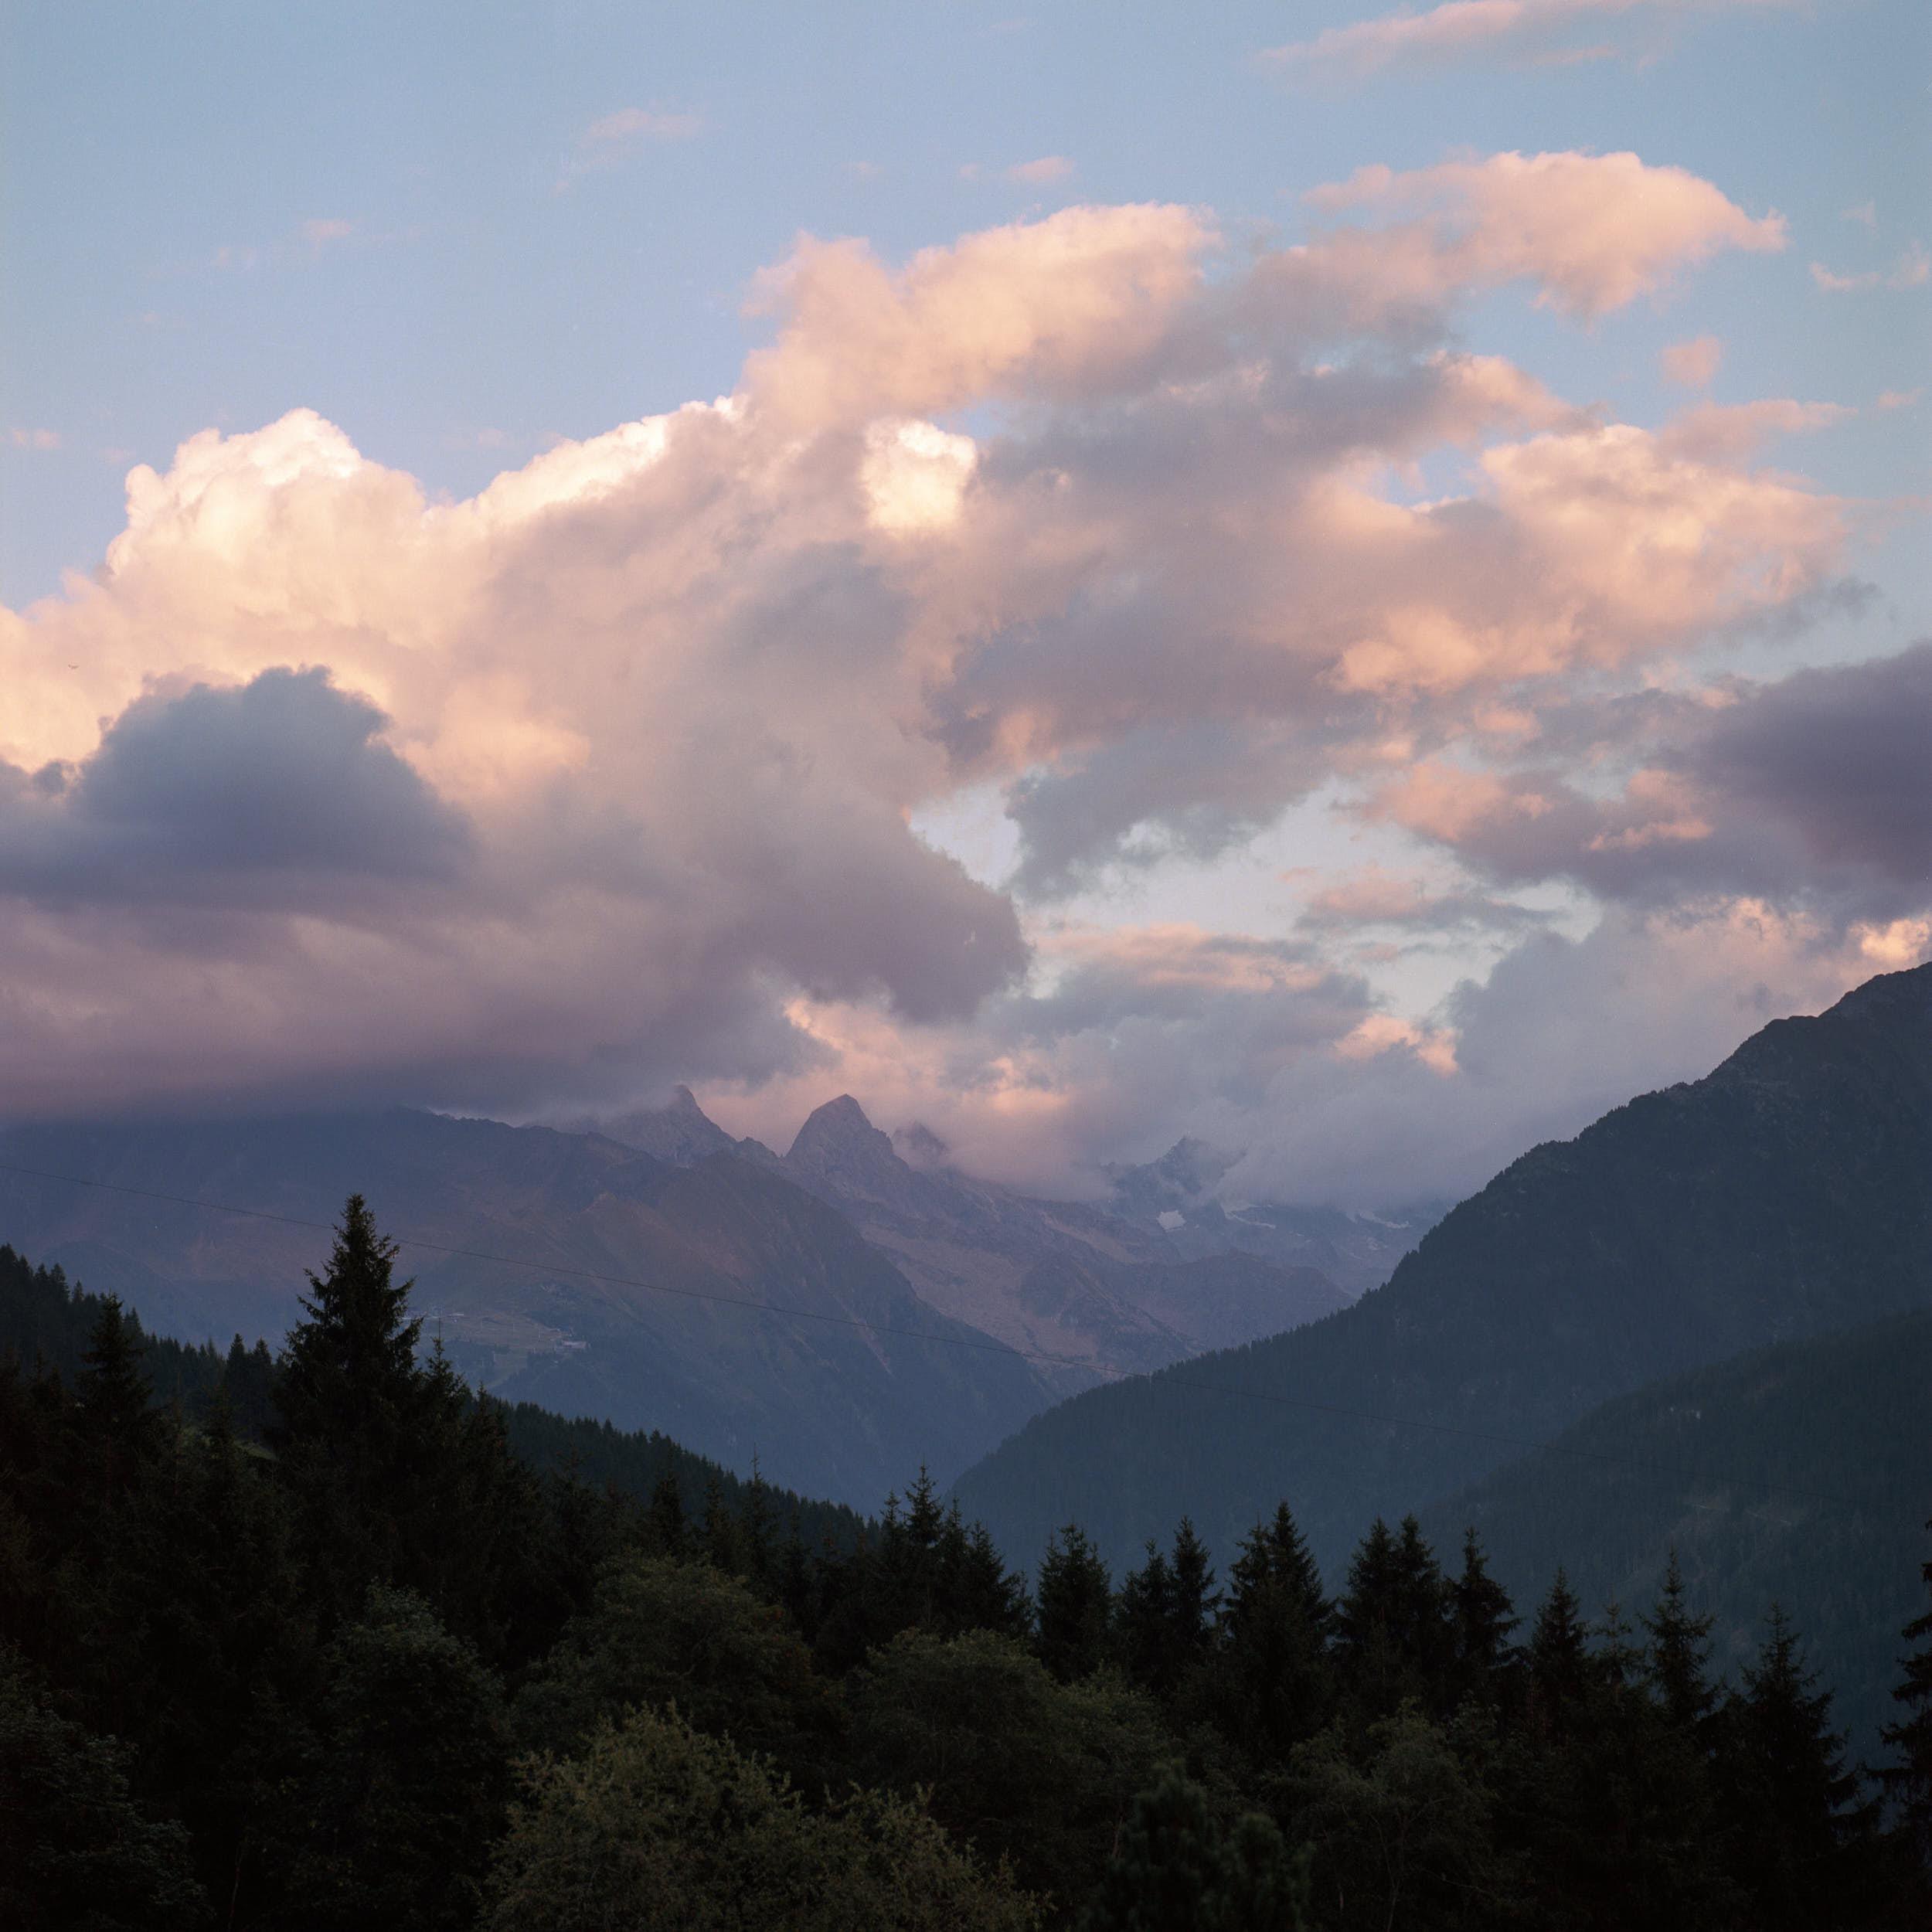 Last sun hitting high alpine peaks with dramatic sky.